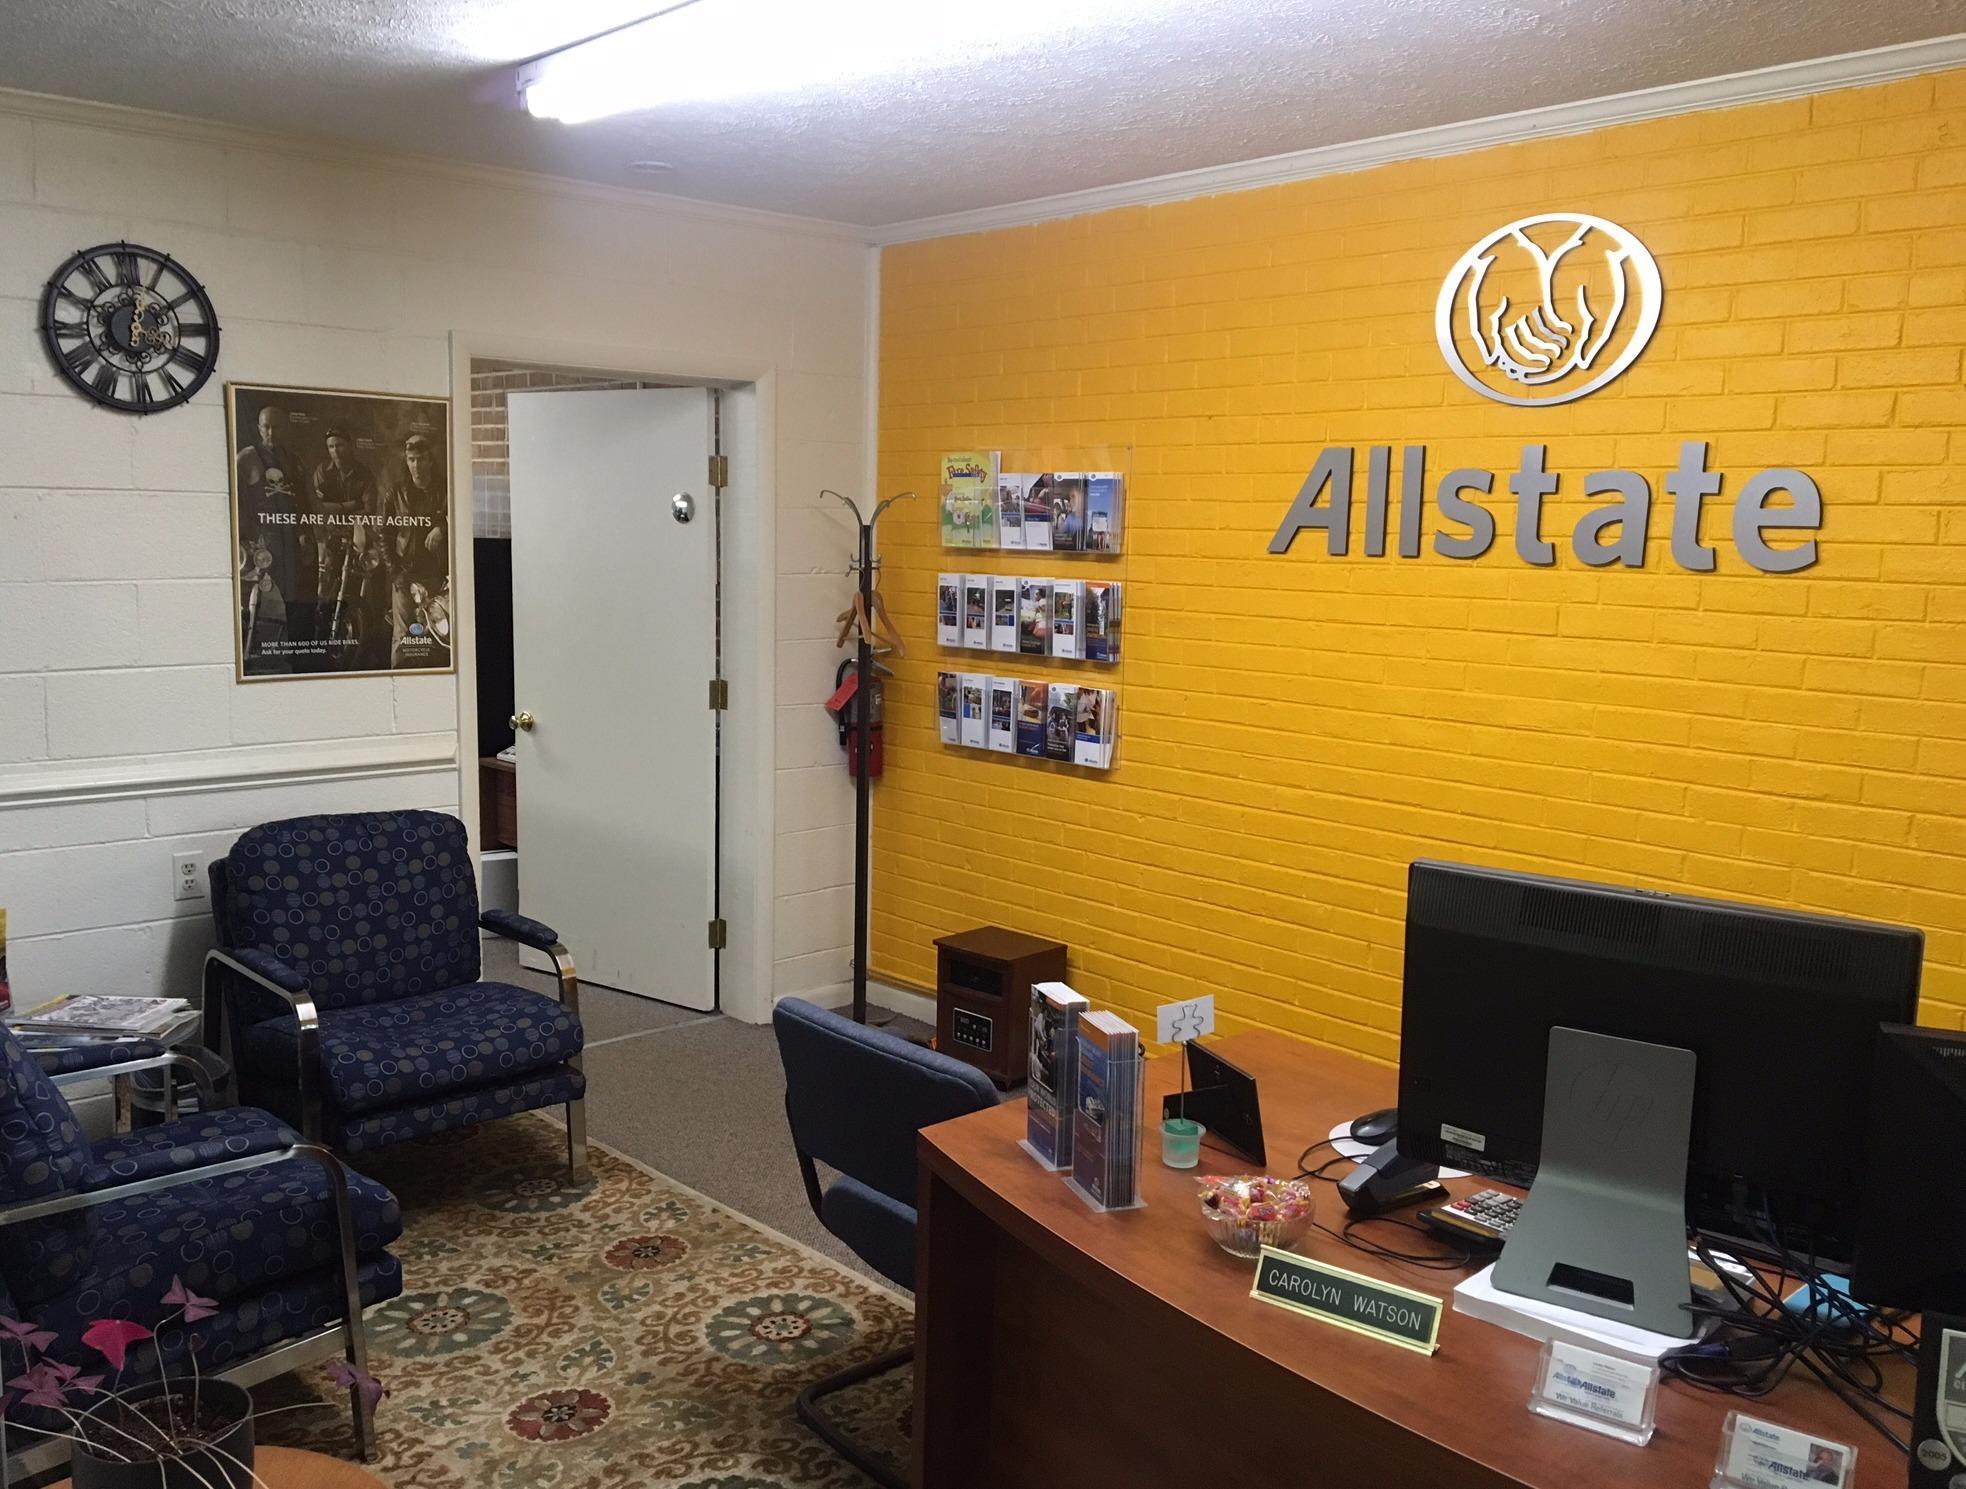 Robert Gammon: Allstate Insurance image 4